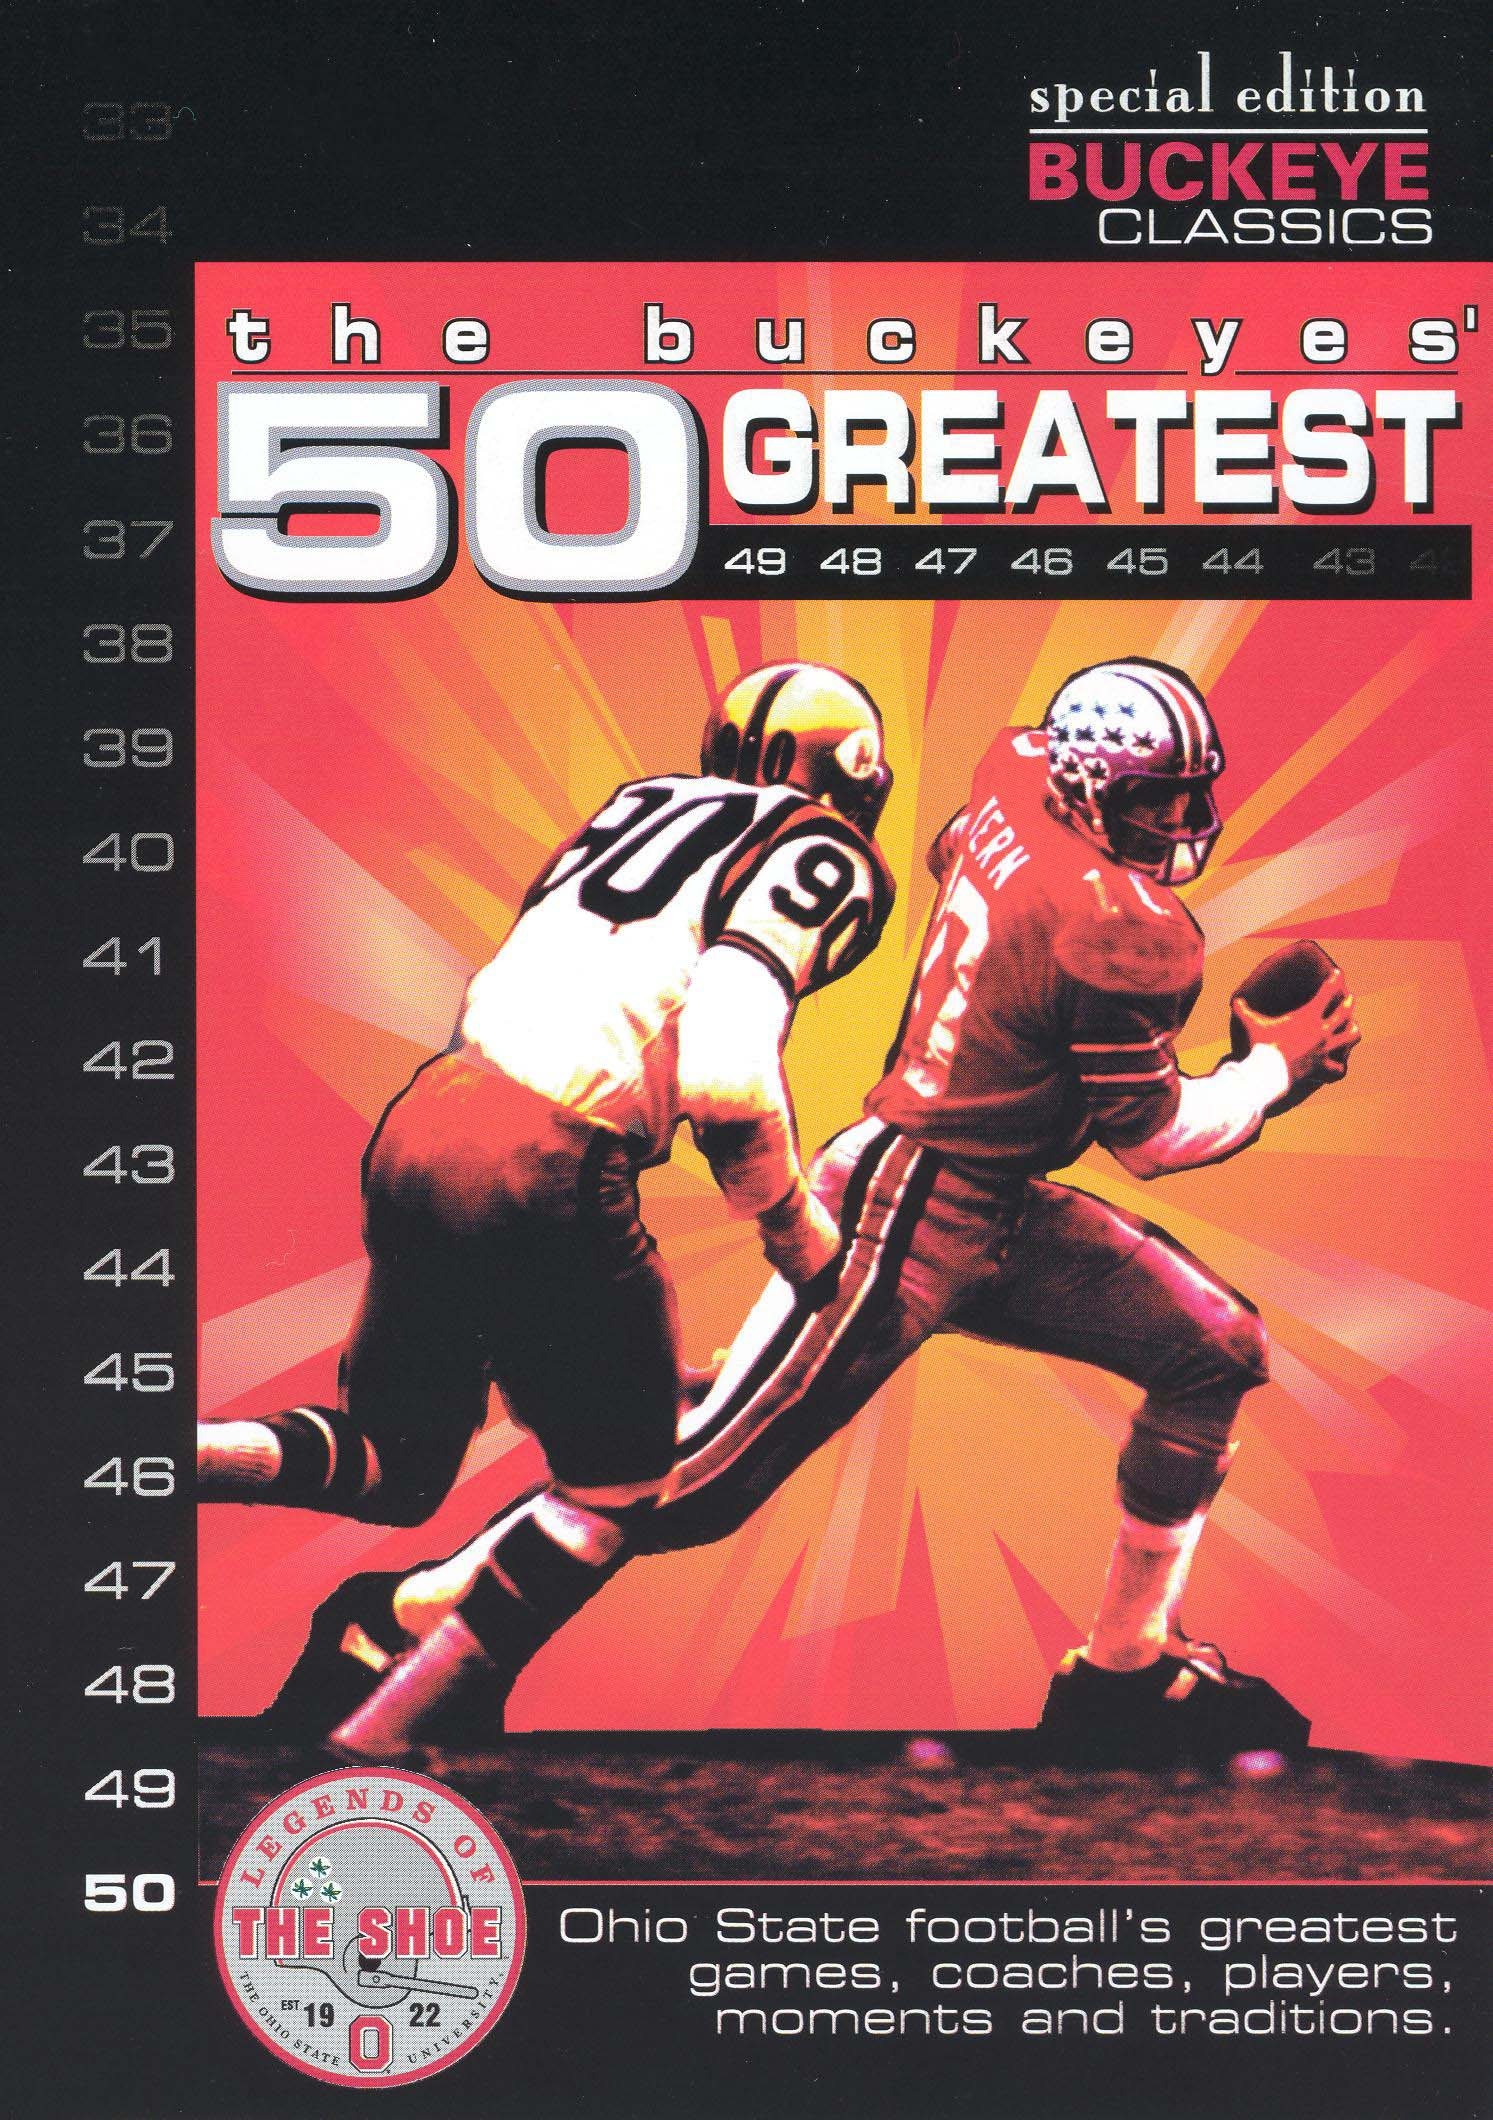 The Buckeyes 50 Greatest